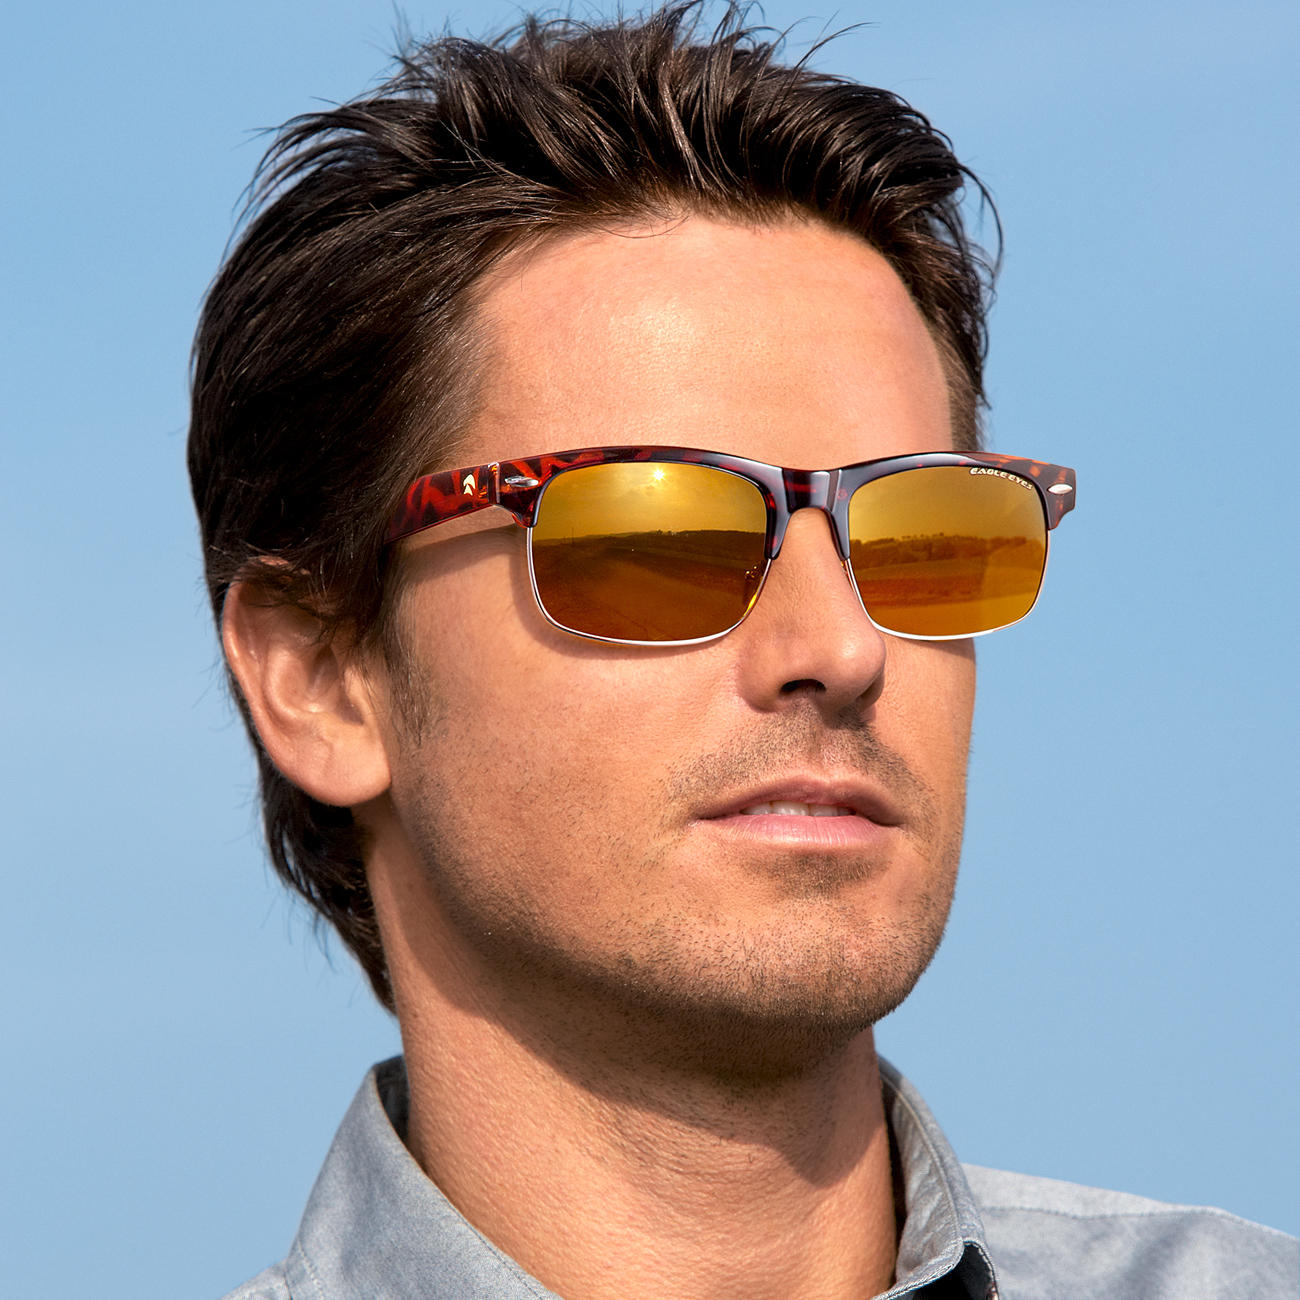 d34e12f38b6 Buy EAGLE EYES® Retro Sunglasses online